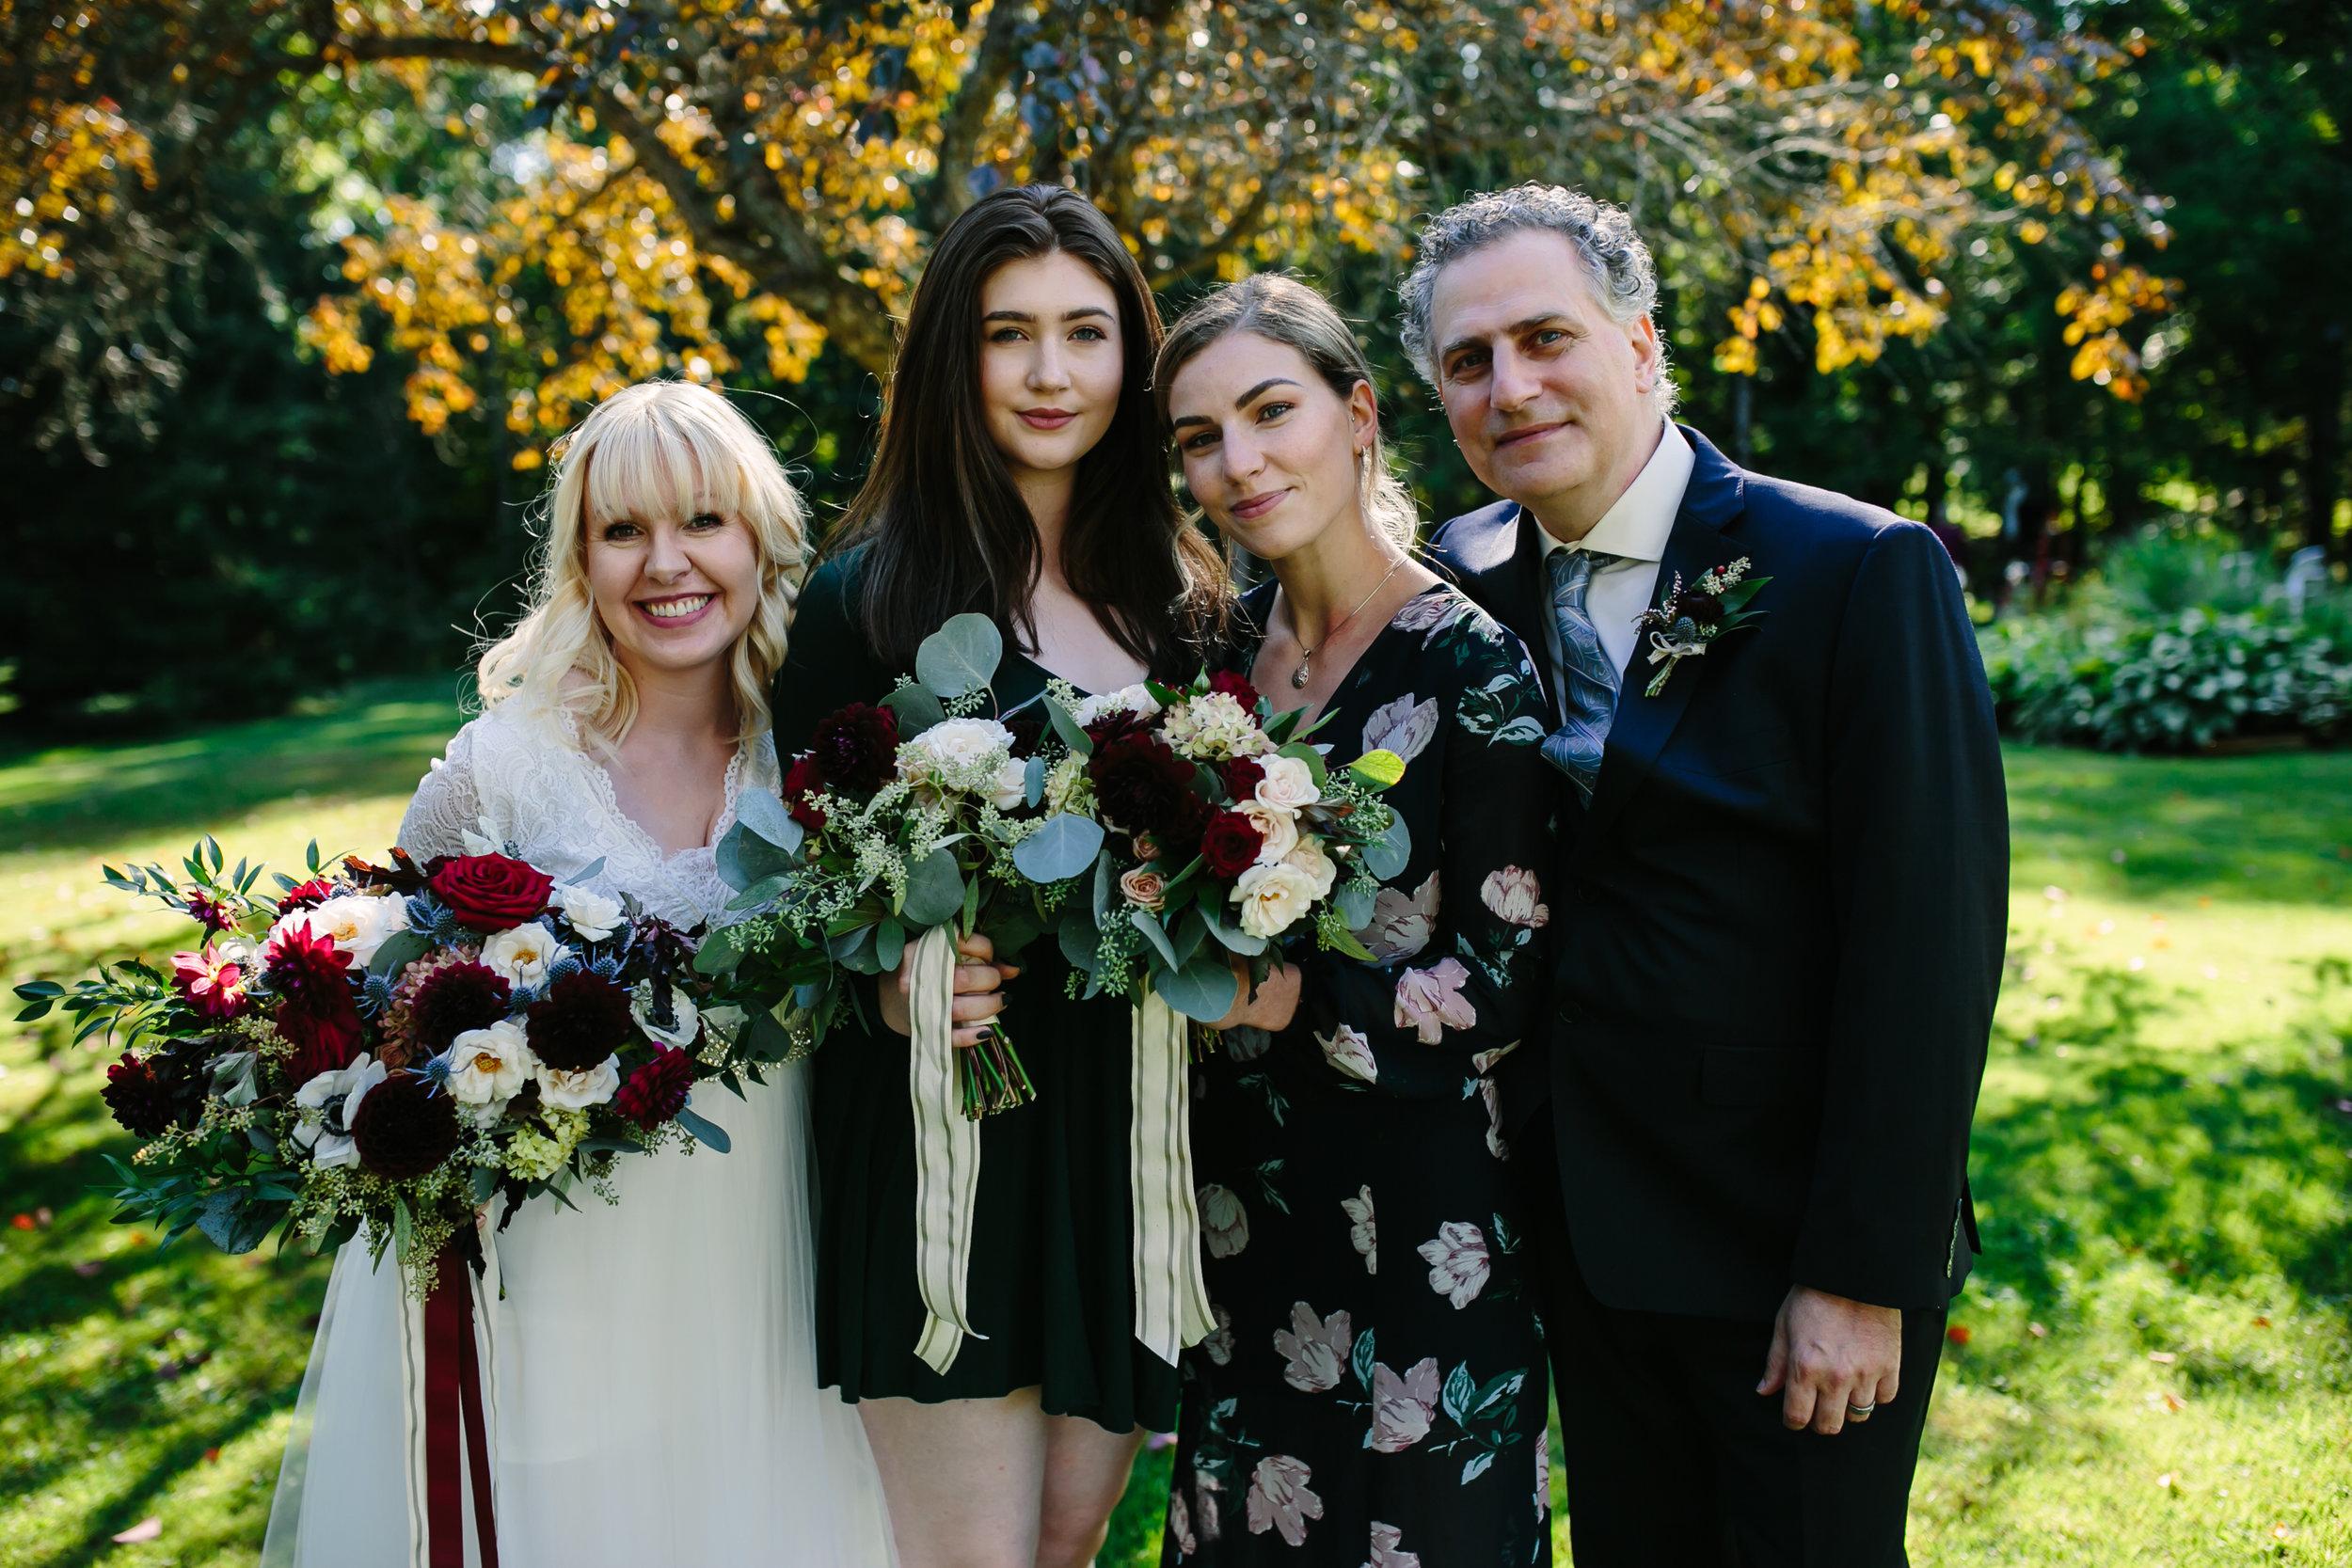 Wedding of four